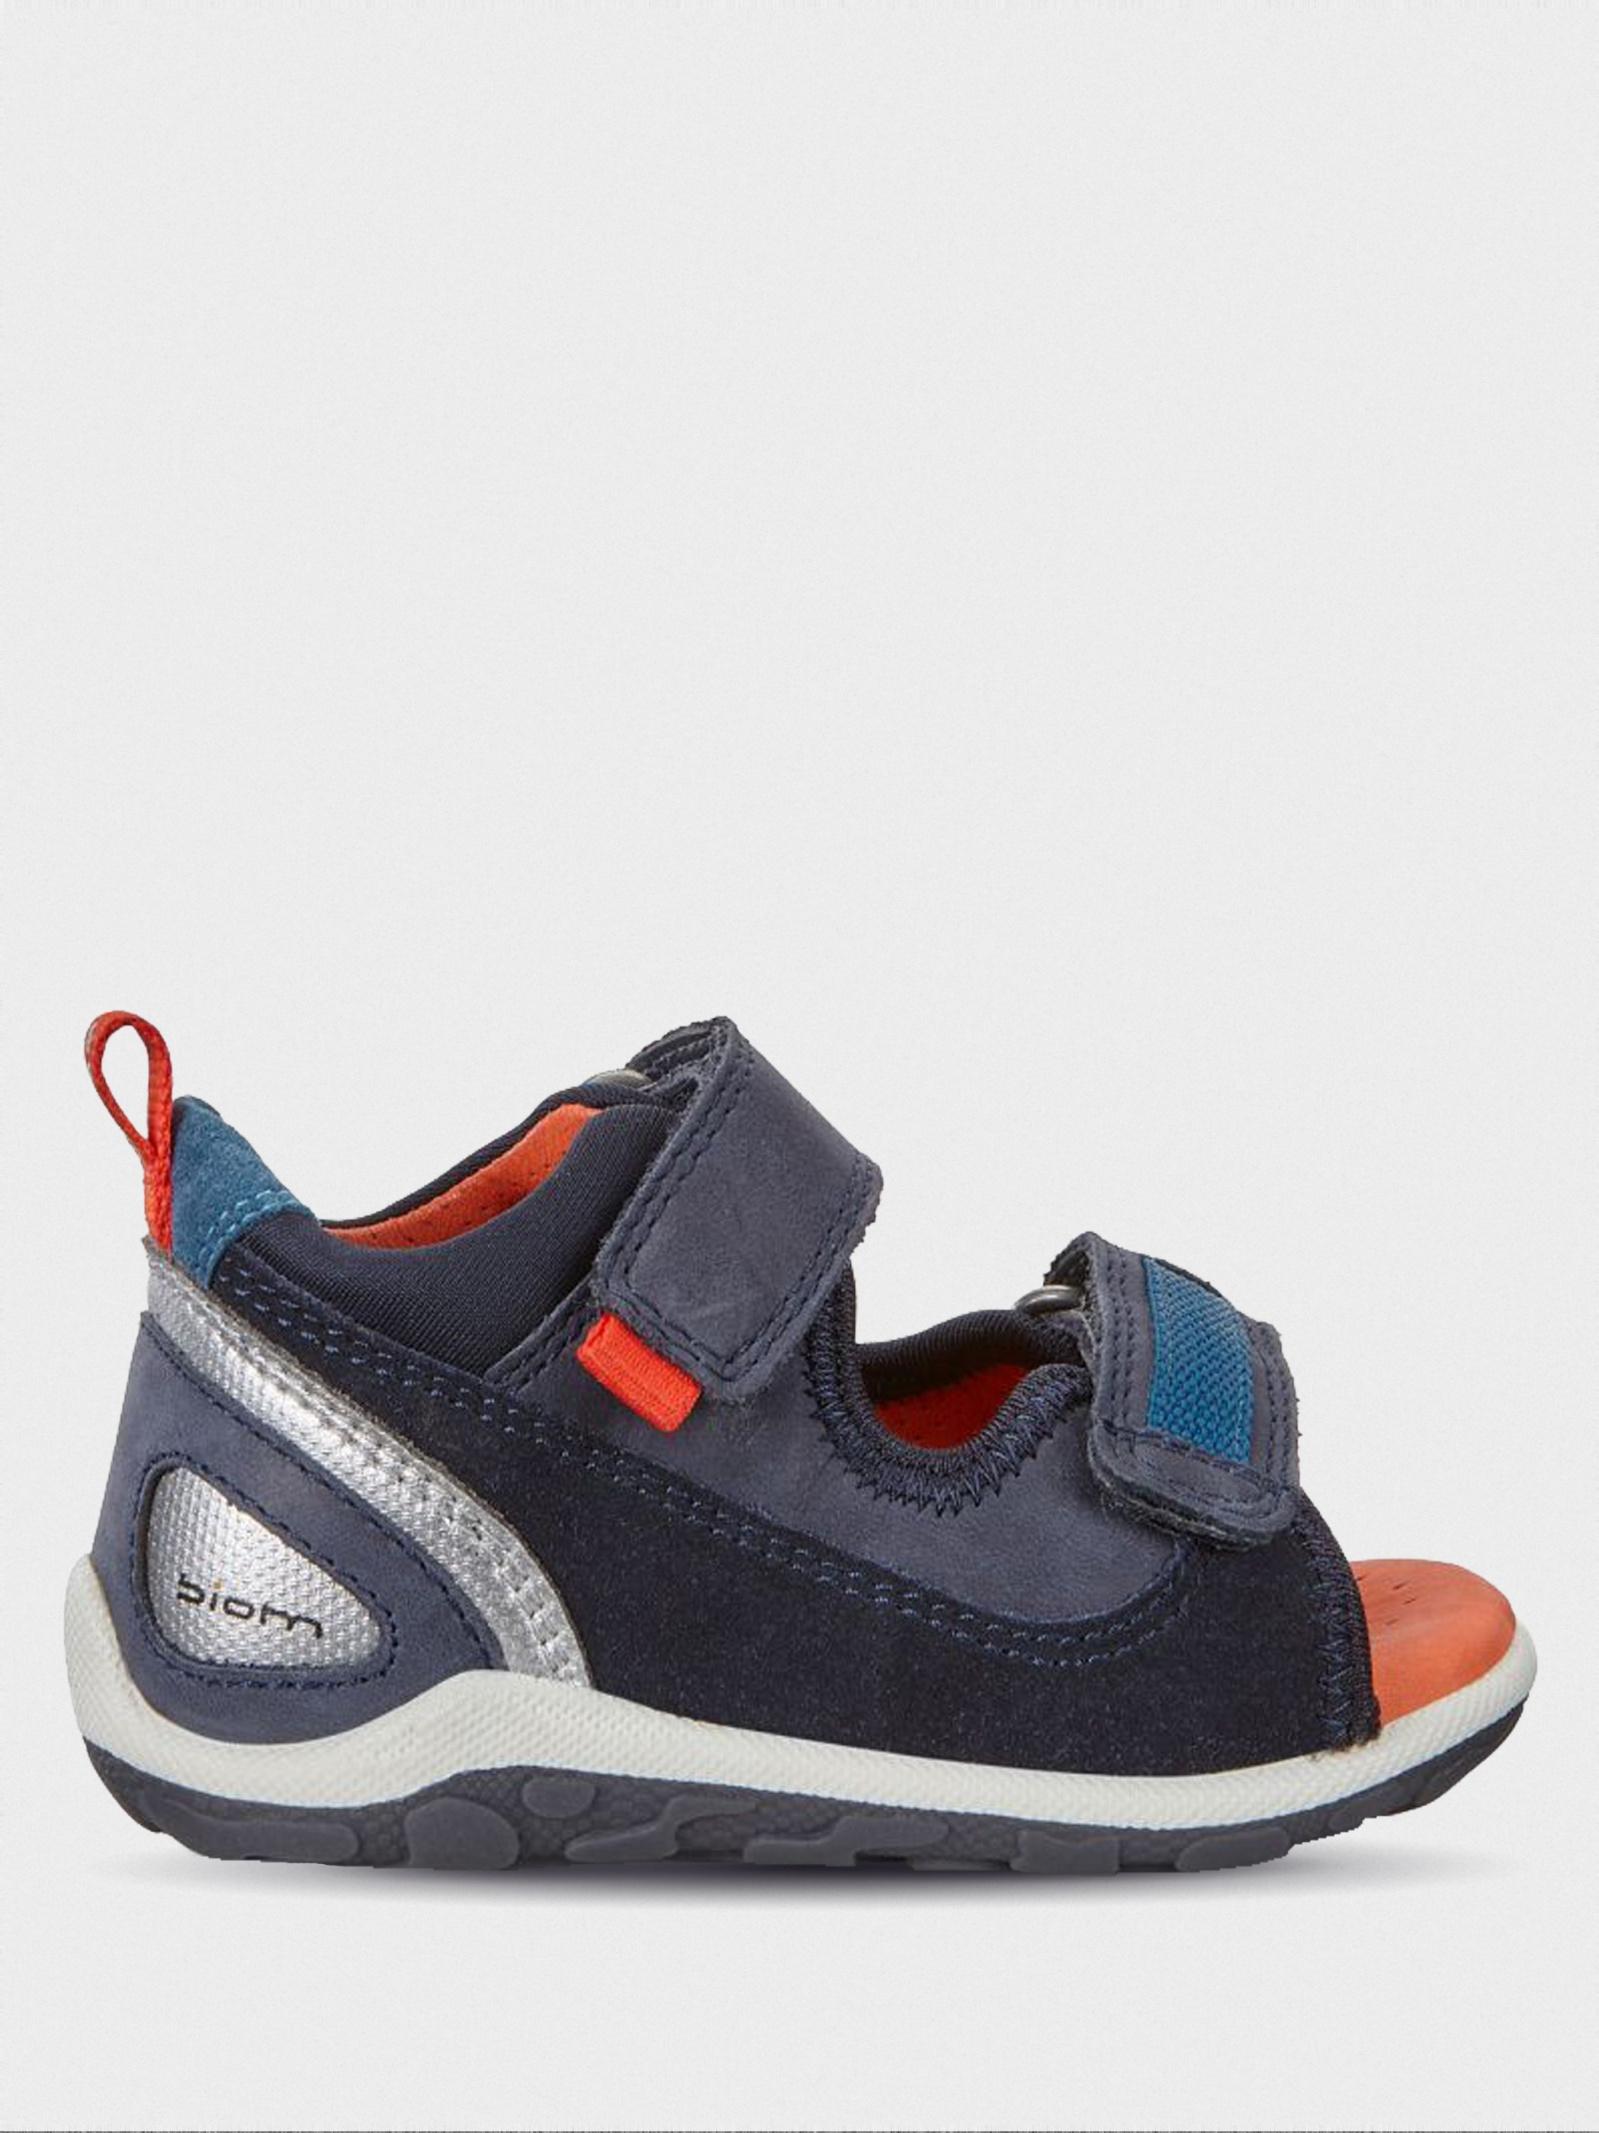 Сандалии для детей ECCO BIOM MINI SANDAL 754821(50769) брендовая обувь, 2017